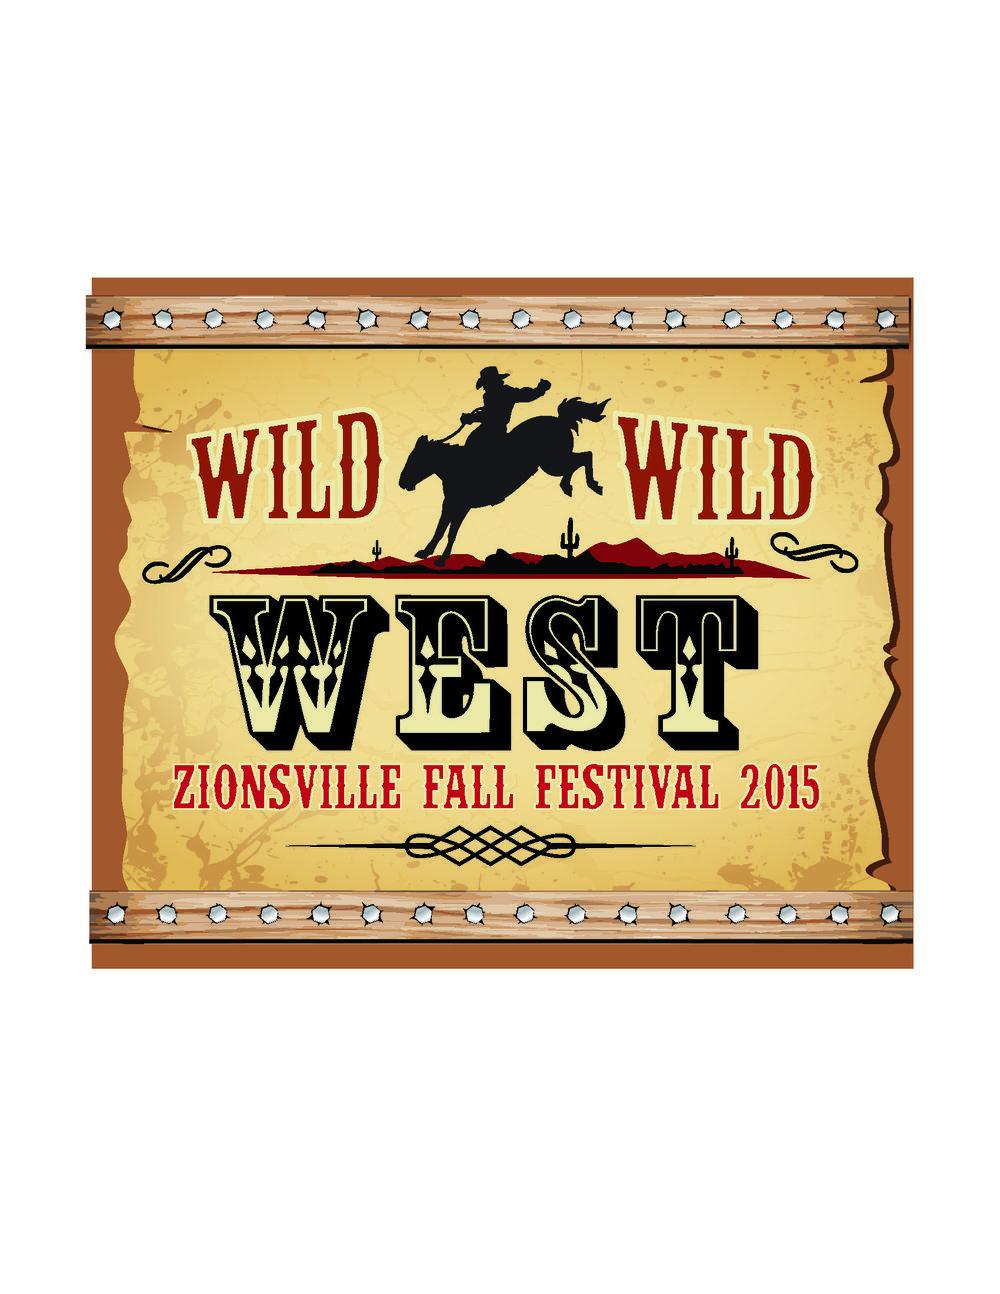 Wild Wild West2 copy.jpg